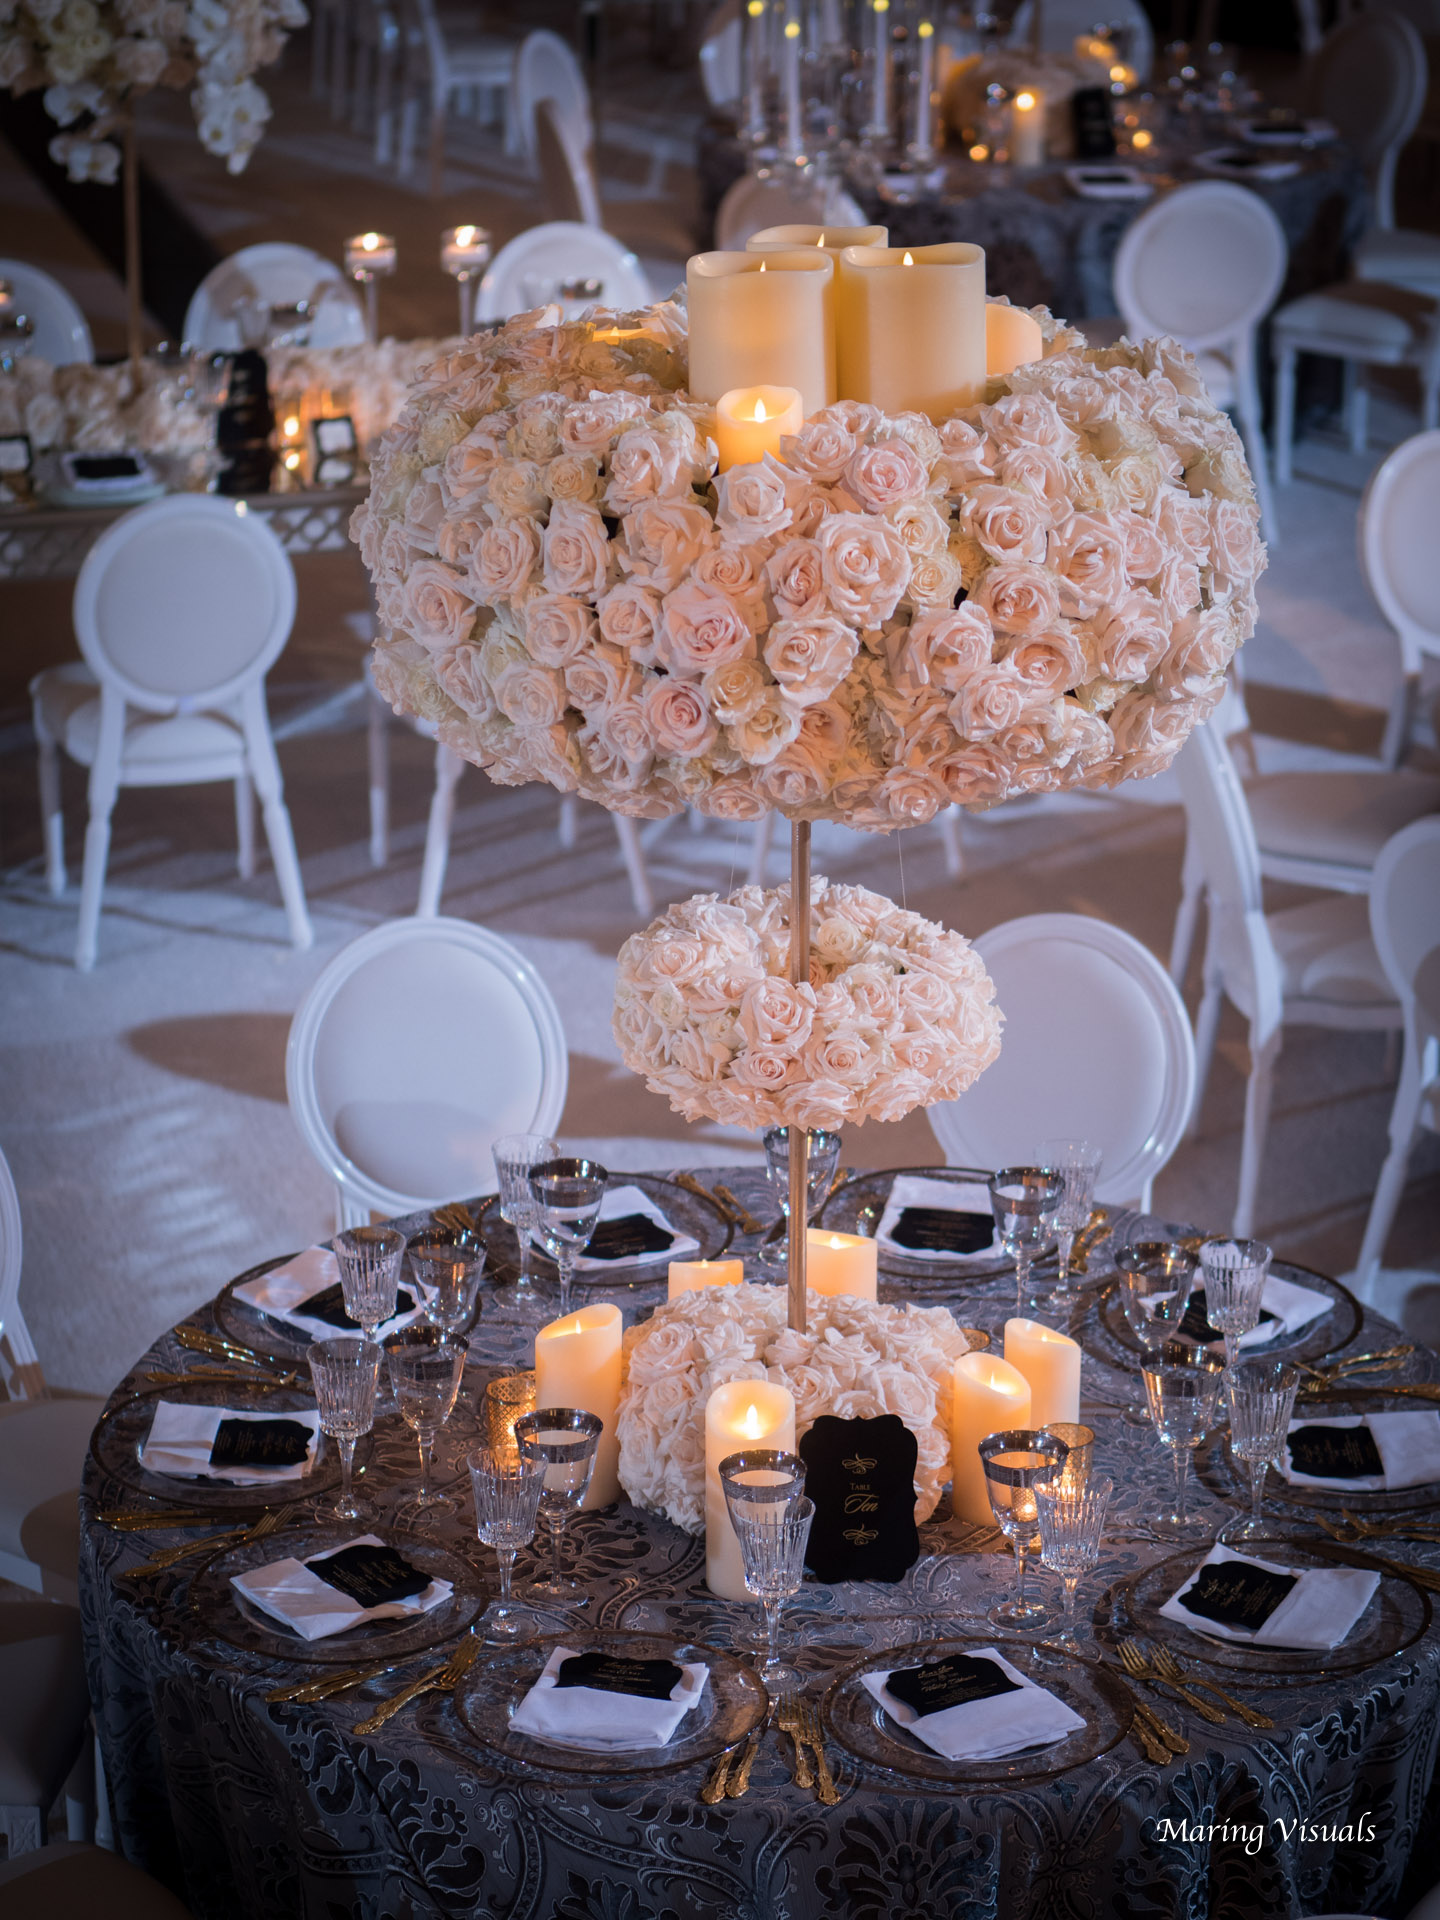 David Tutera Weddings by Maring Visuals 00542.jpg